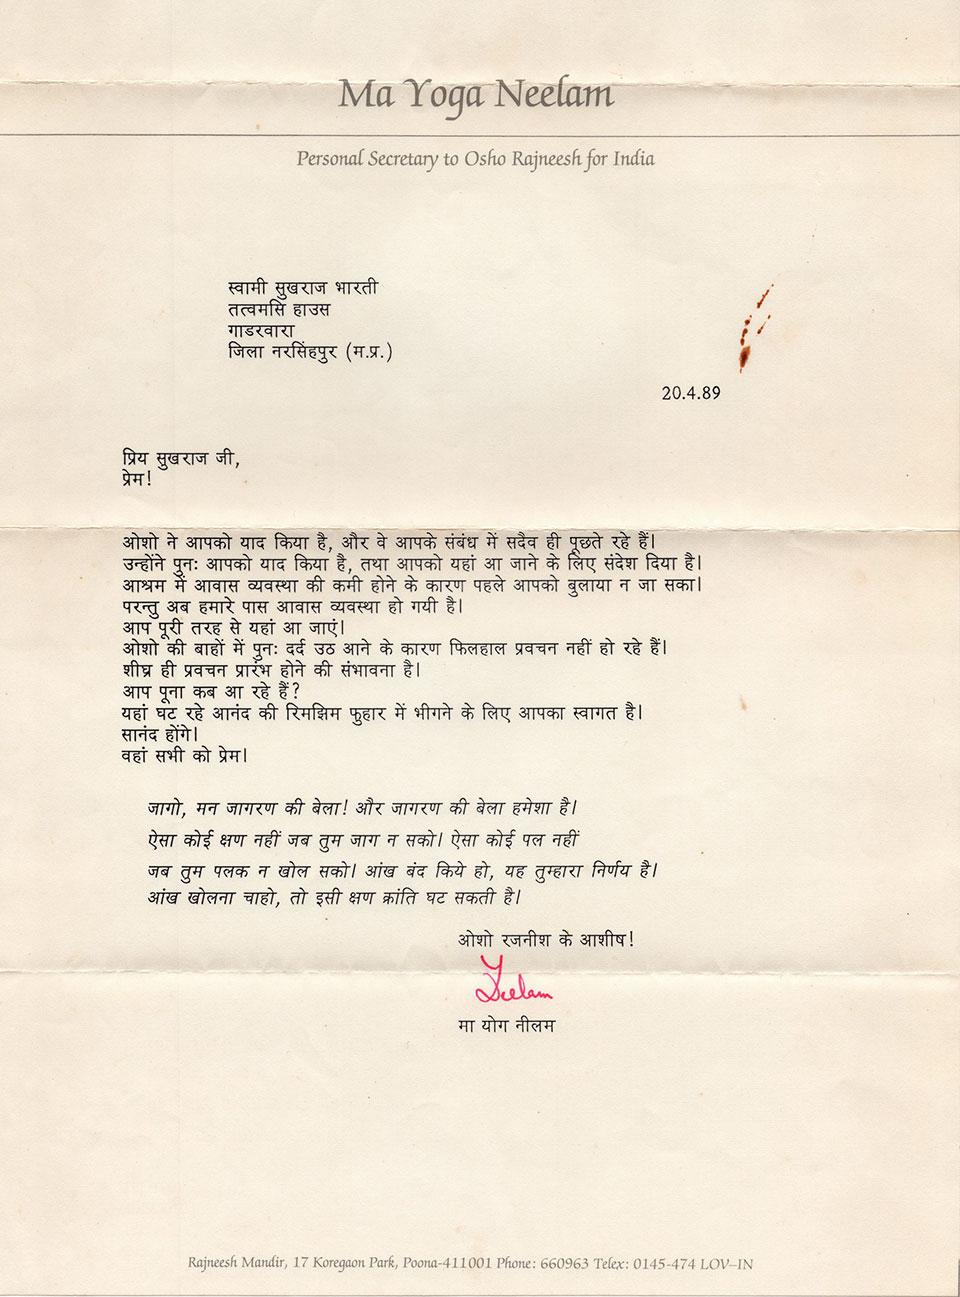 Letter by Neelam to Sukhraj Bharti